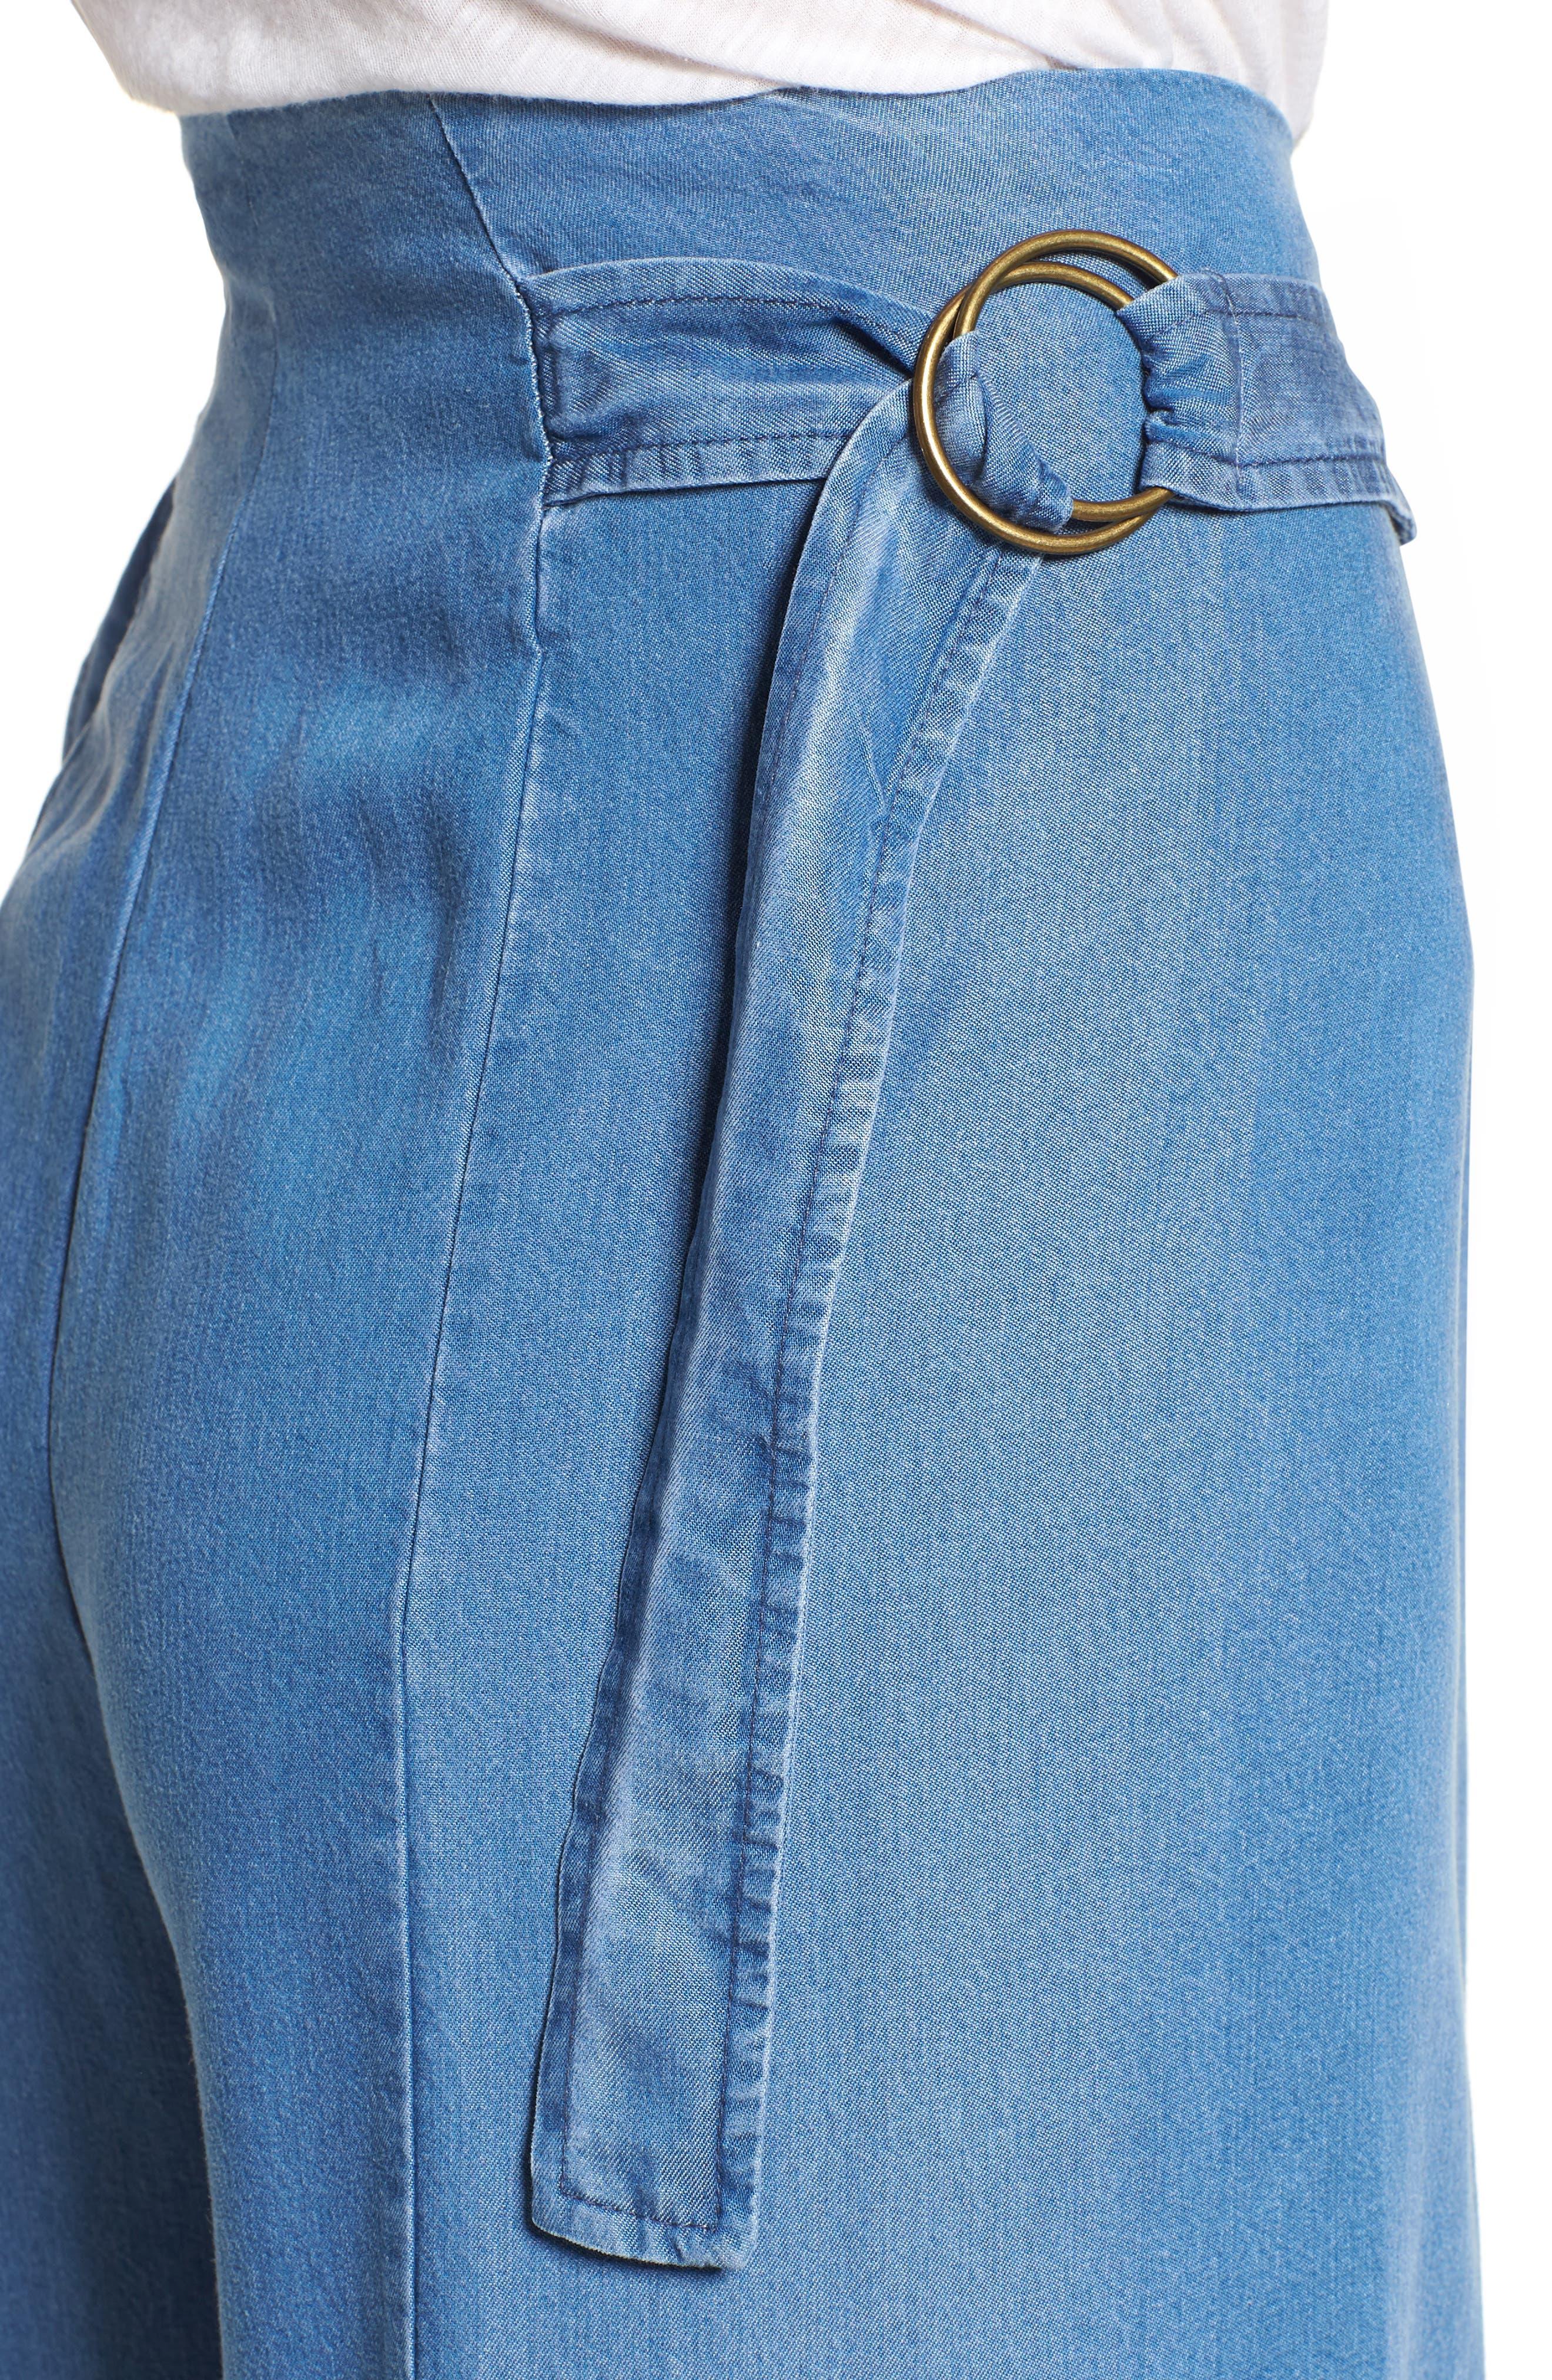 Bishop + Young O-Ring Wide Leg Denim Pants,                             Alternate thumbnail 4, color,                             CHAMBRAY